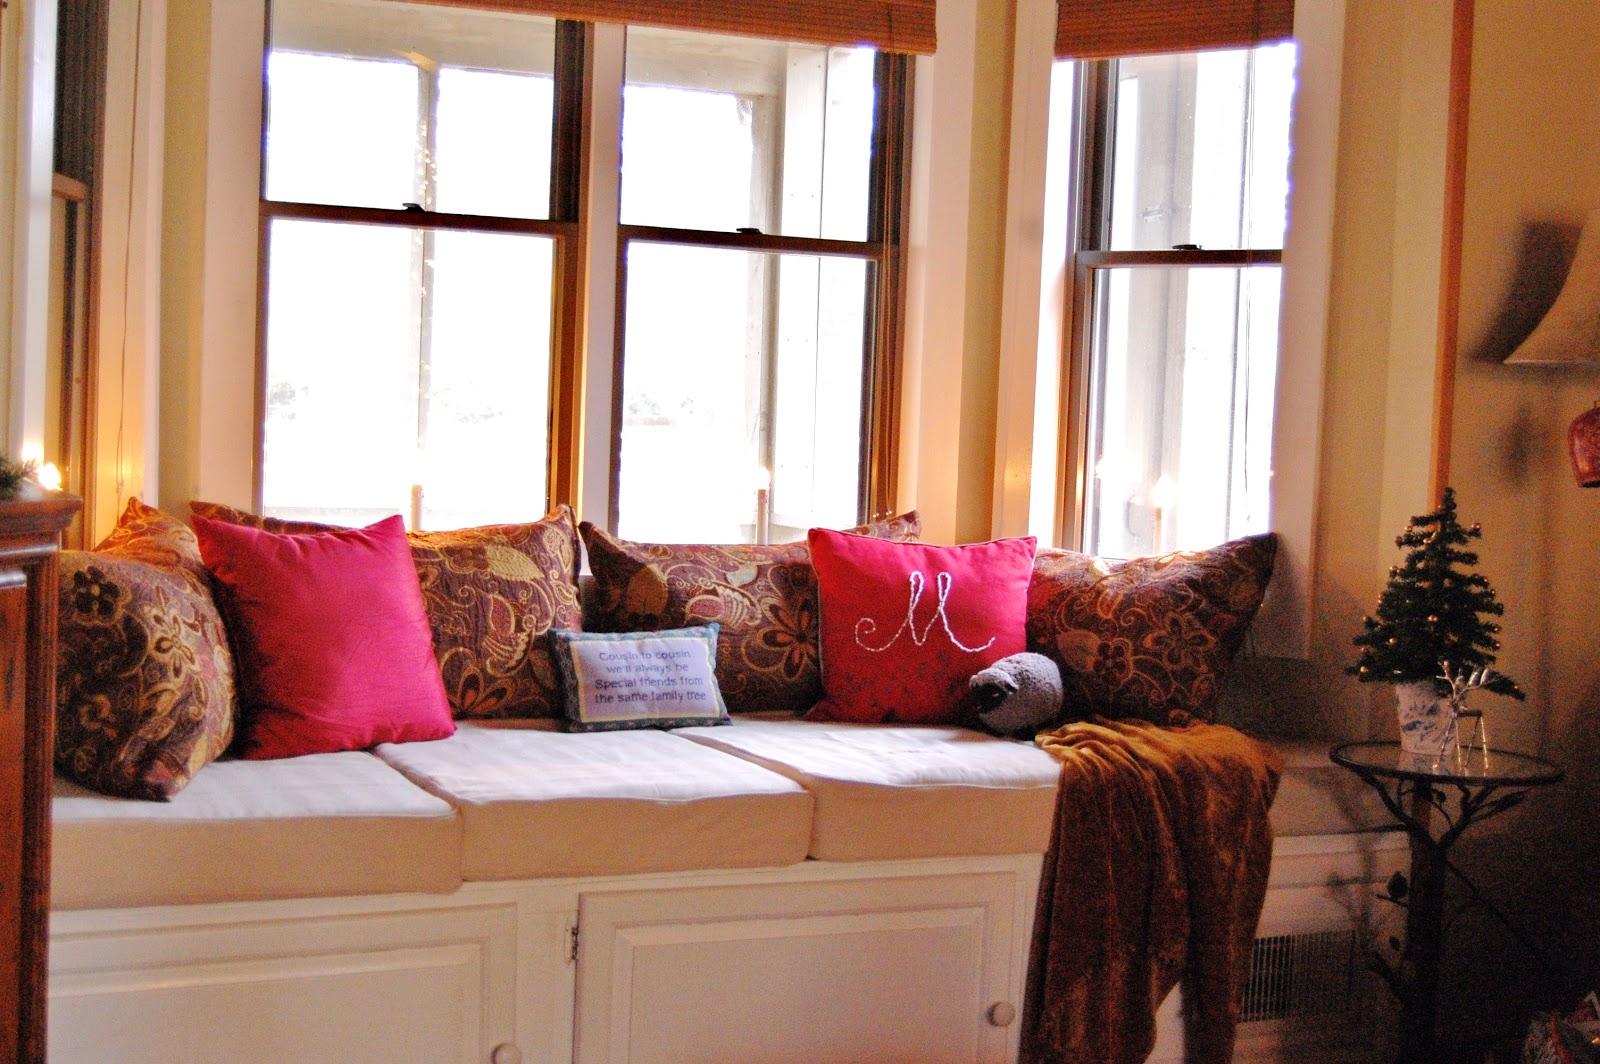 Terrific Tidy Brown Wren Bringing Order To Your Nest Upcycled Uwap Interior Chair Design Uwaporg